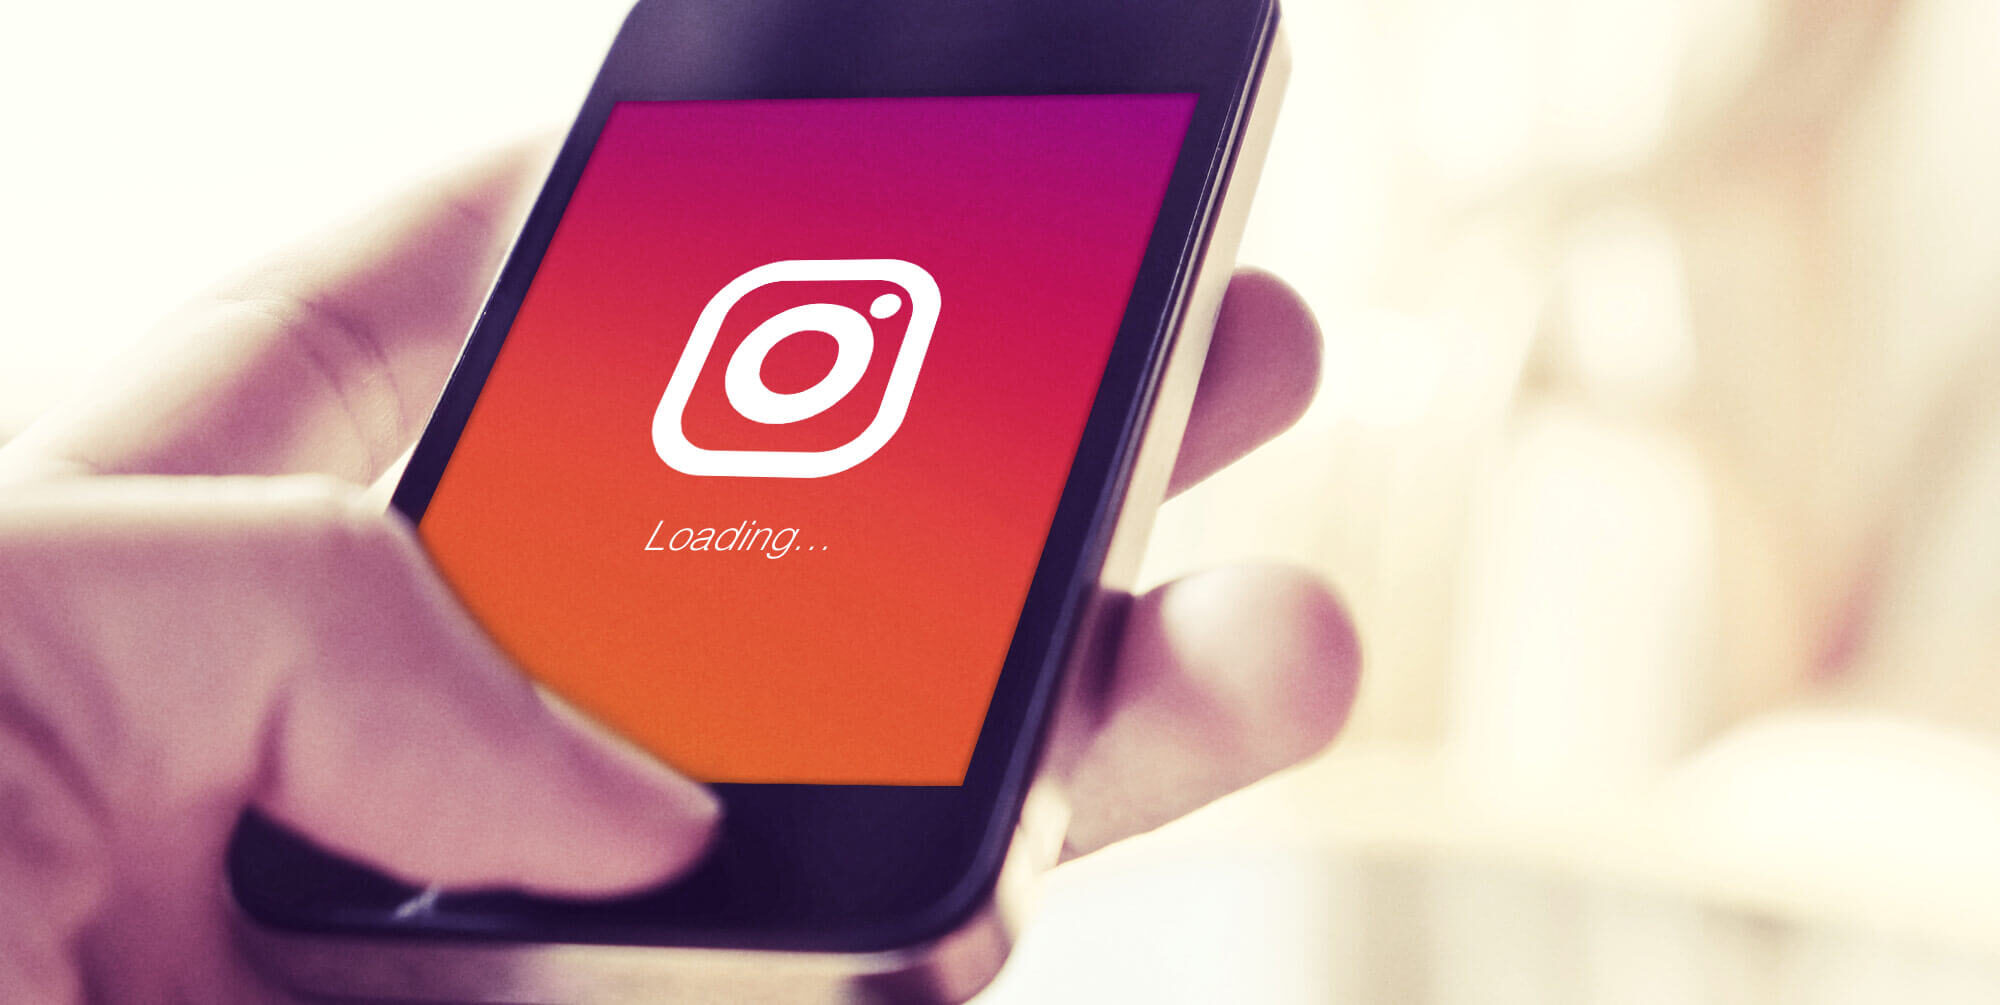 snw-website-instagrams-new-feature-2000x1005